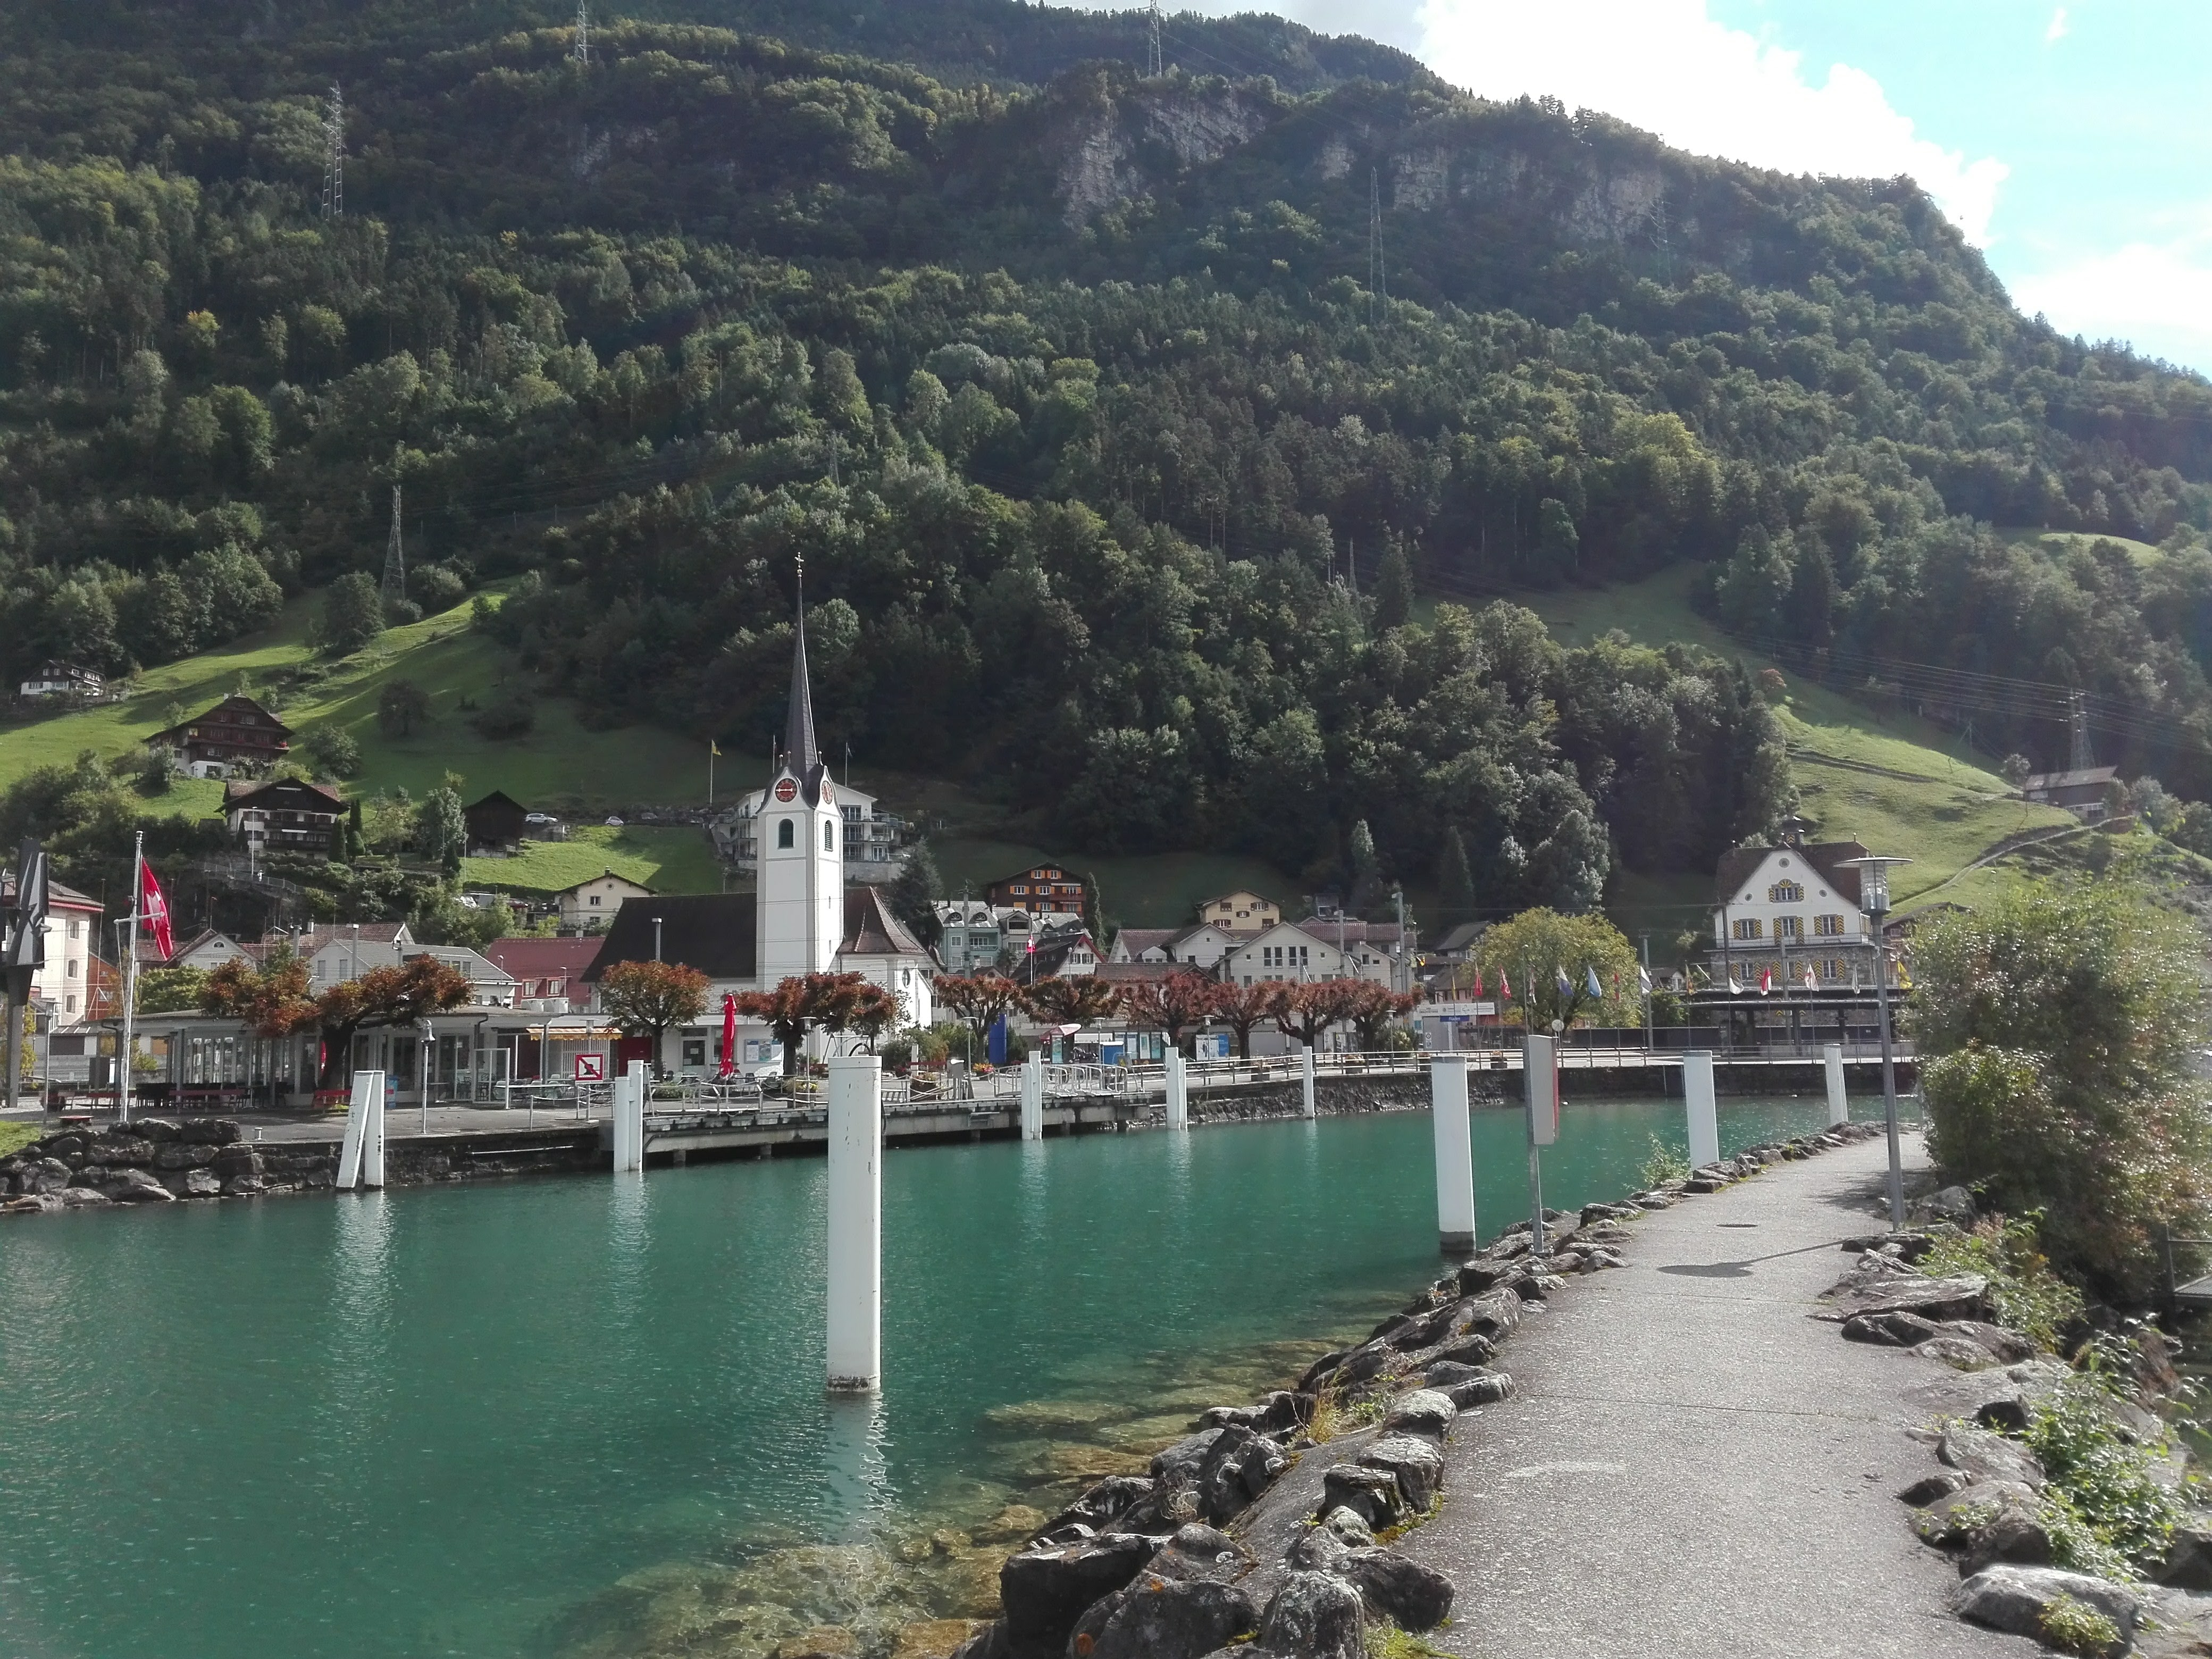 Fluehlen, Svizzera